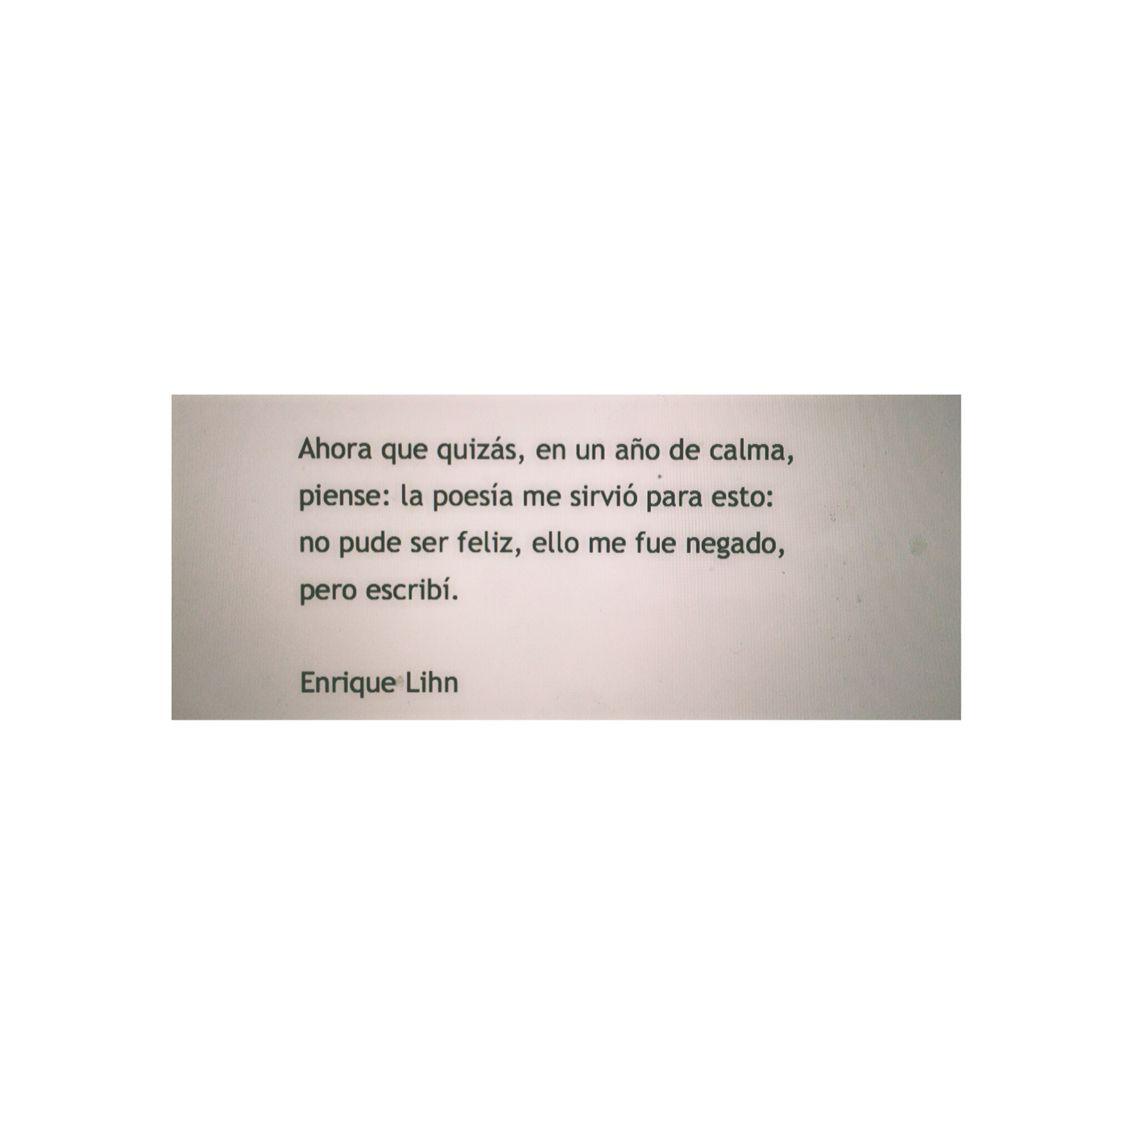 Escribí. Enrique Lihn